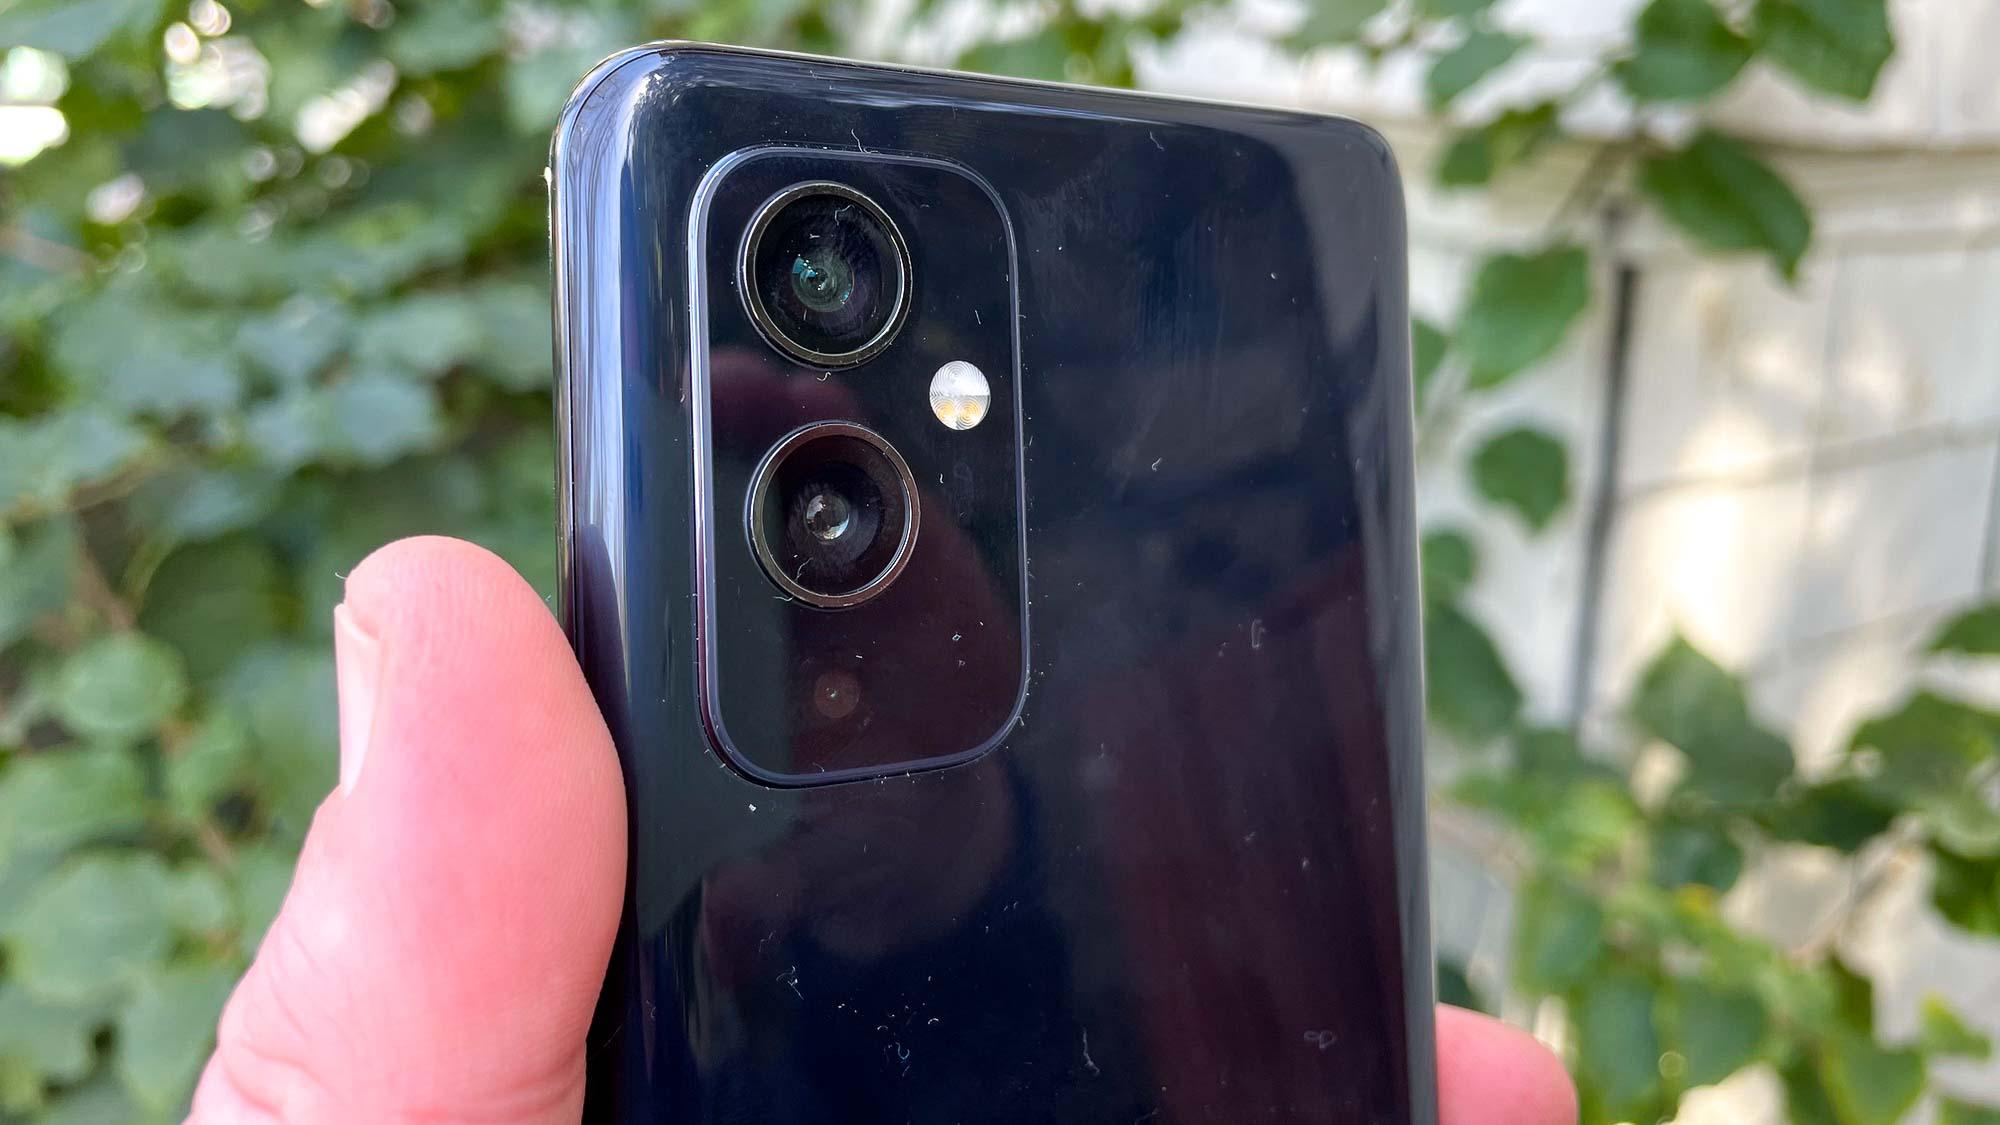 OnePlus 9T: OnePlus 9 rear cameras